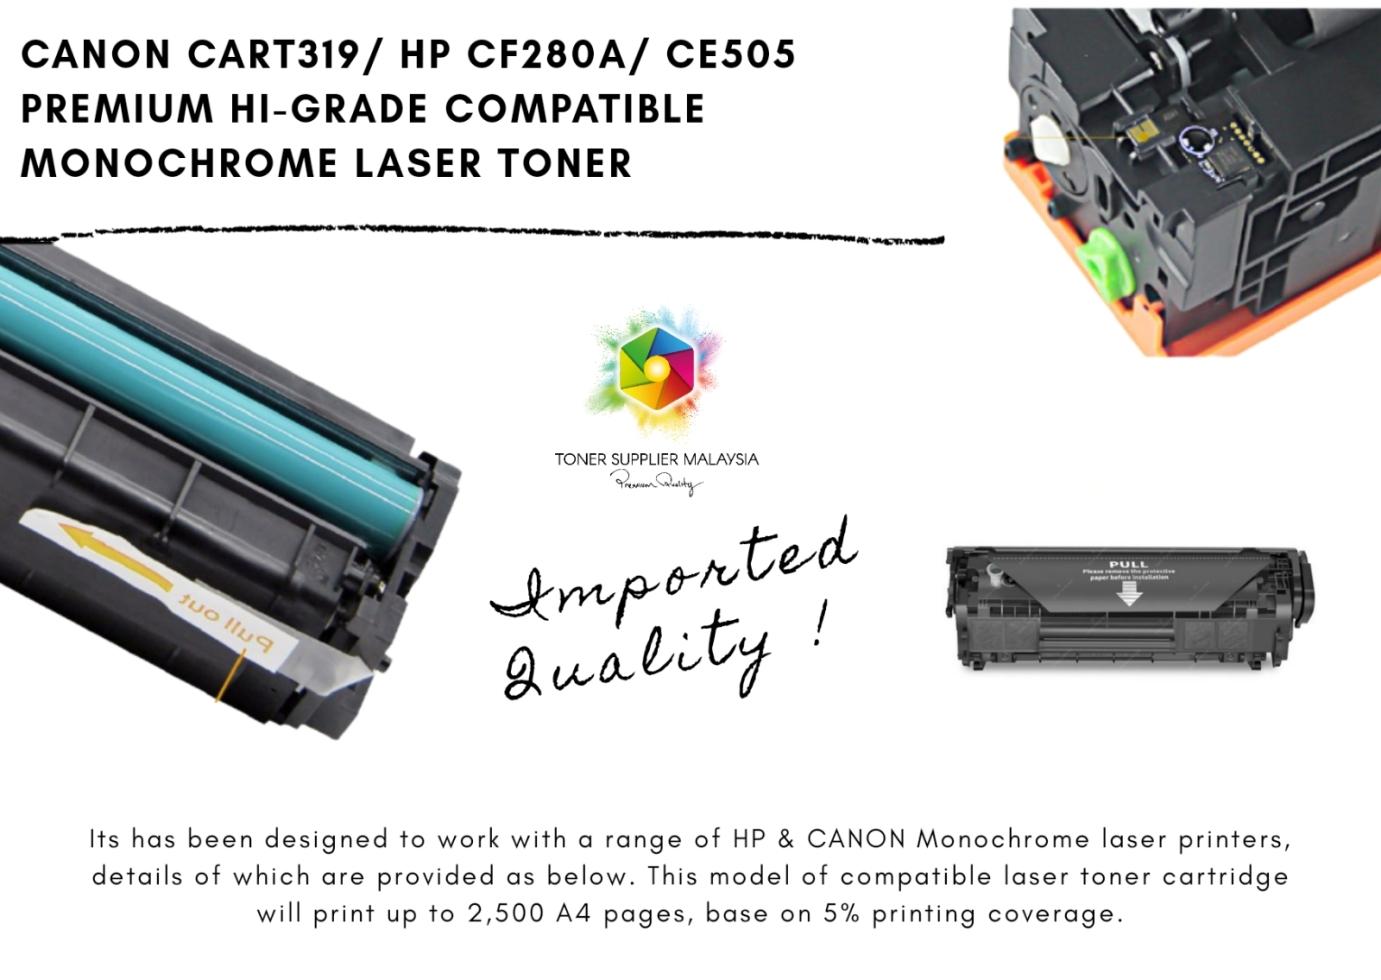 PREMIUM HI-GRADE CANON CART 319 / HP CF280A / 505A COMPATIBLE MONOCHROME LASER TONER